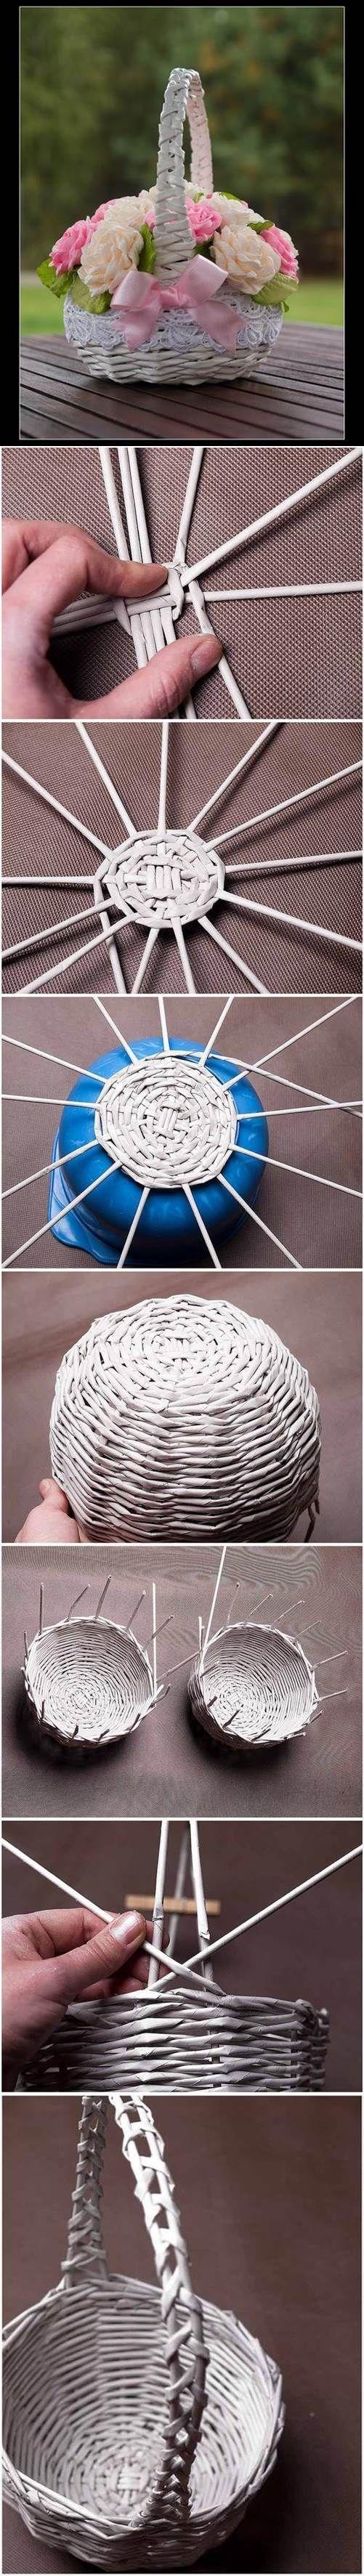 DIY Newspaper Tubes Weaving Basket | iCreativeIdeas.com Follow Us on Facebook --> https://www.facebook.com/icreativeideas: